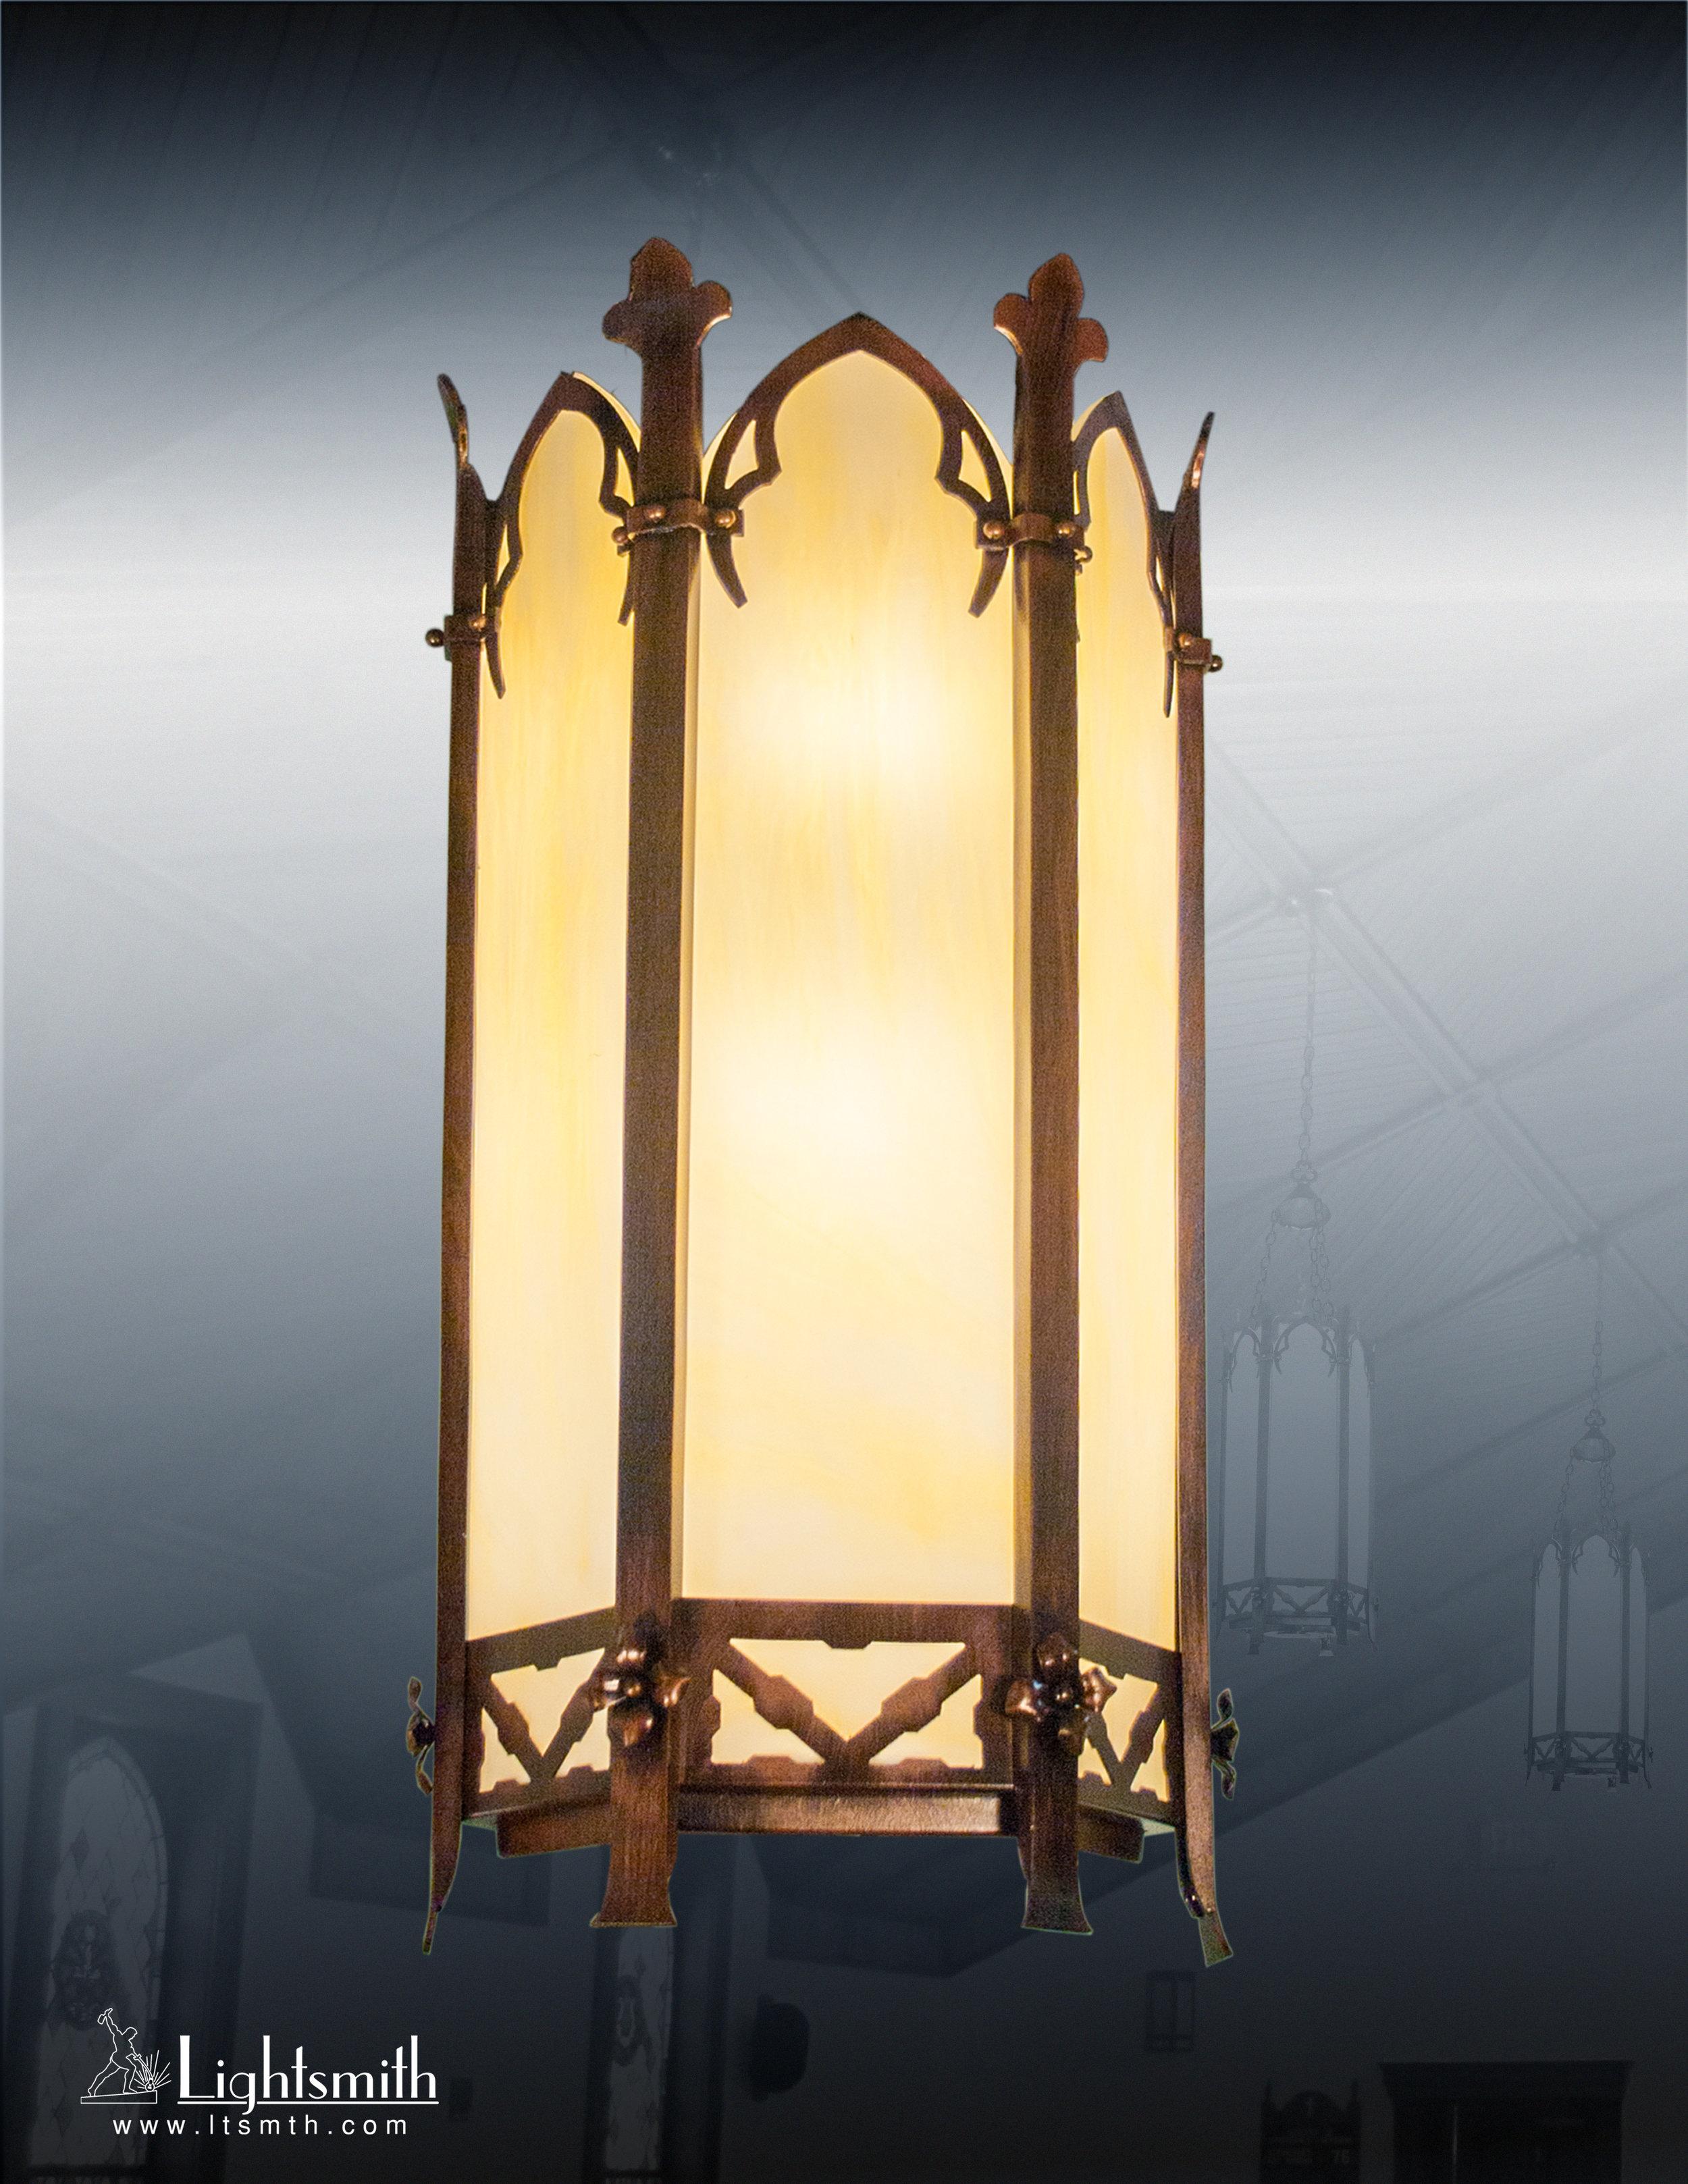 1610-WT - Antique Bronze - Streaked Opal Glass